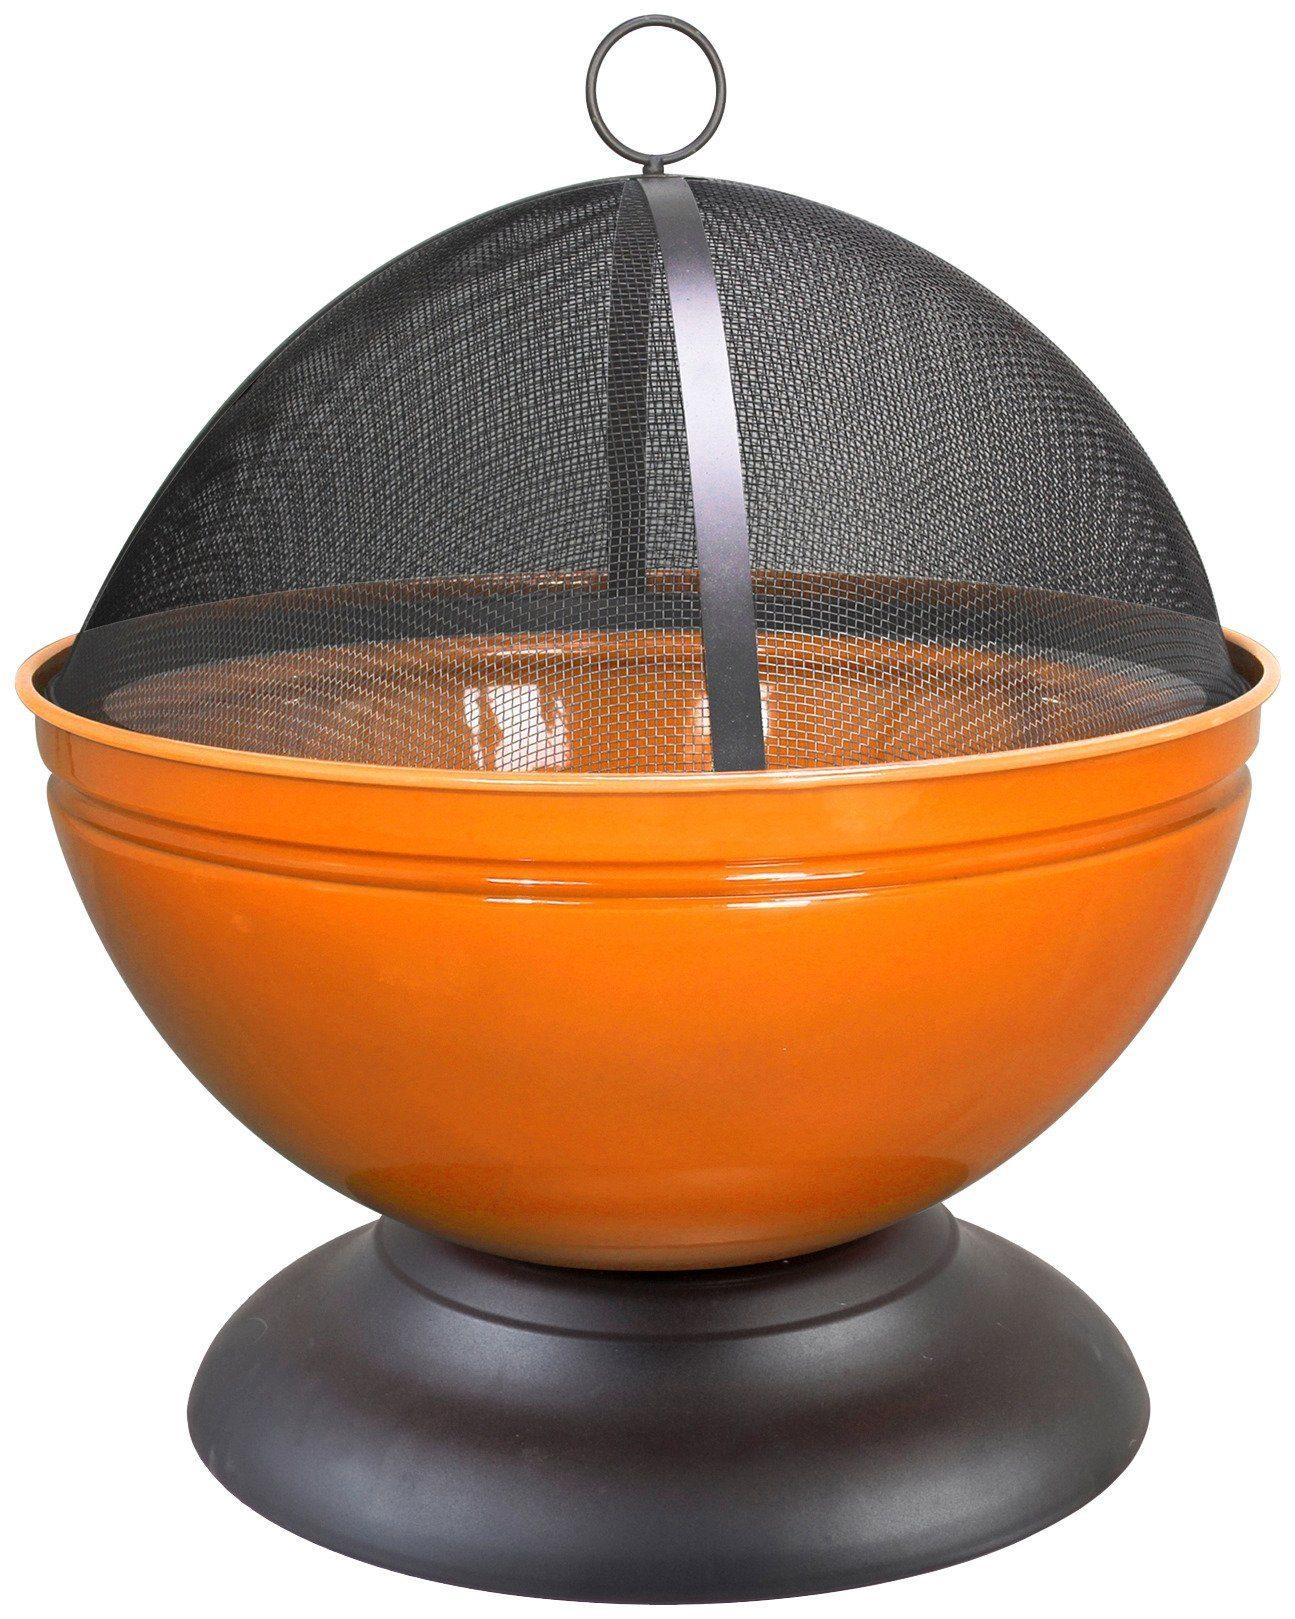 Feuerschale »Globe« inkl. Funkenschutzhaube, orange